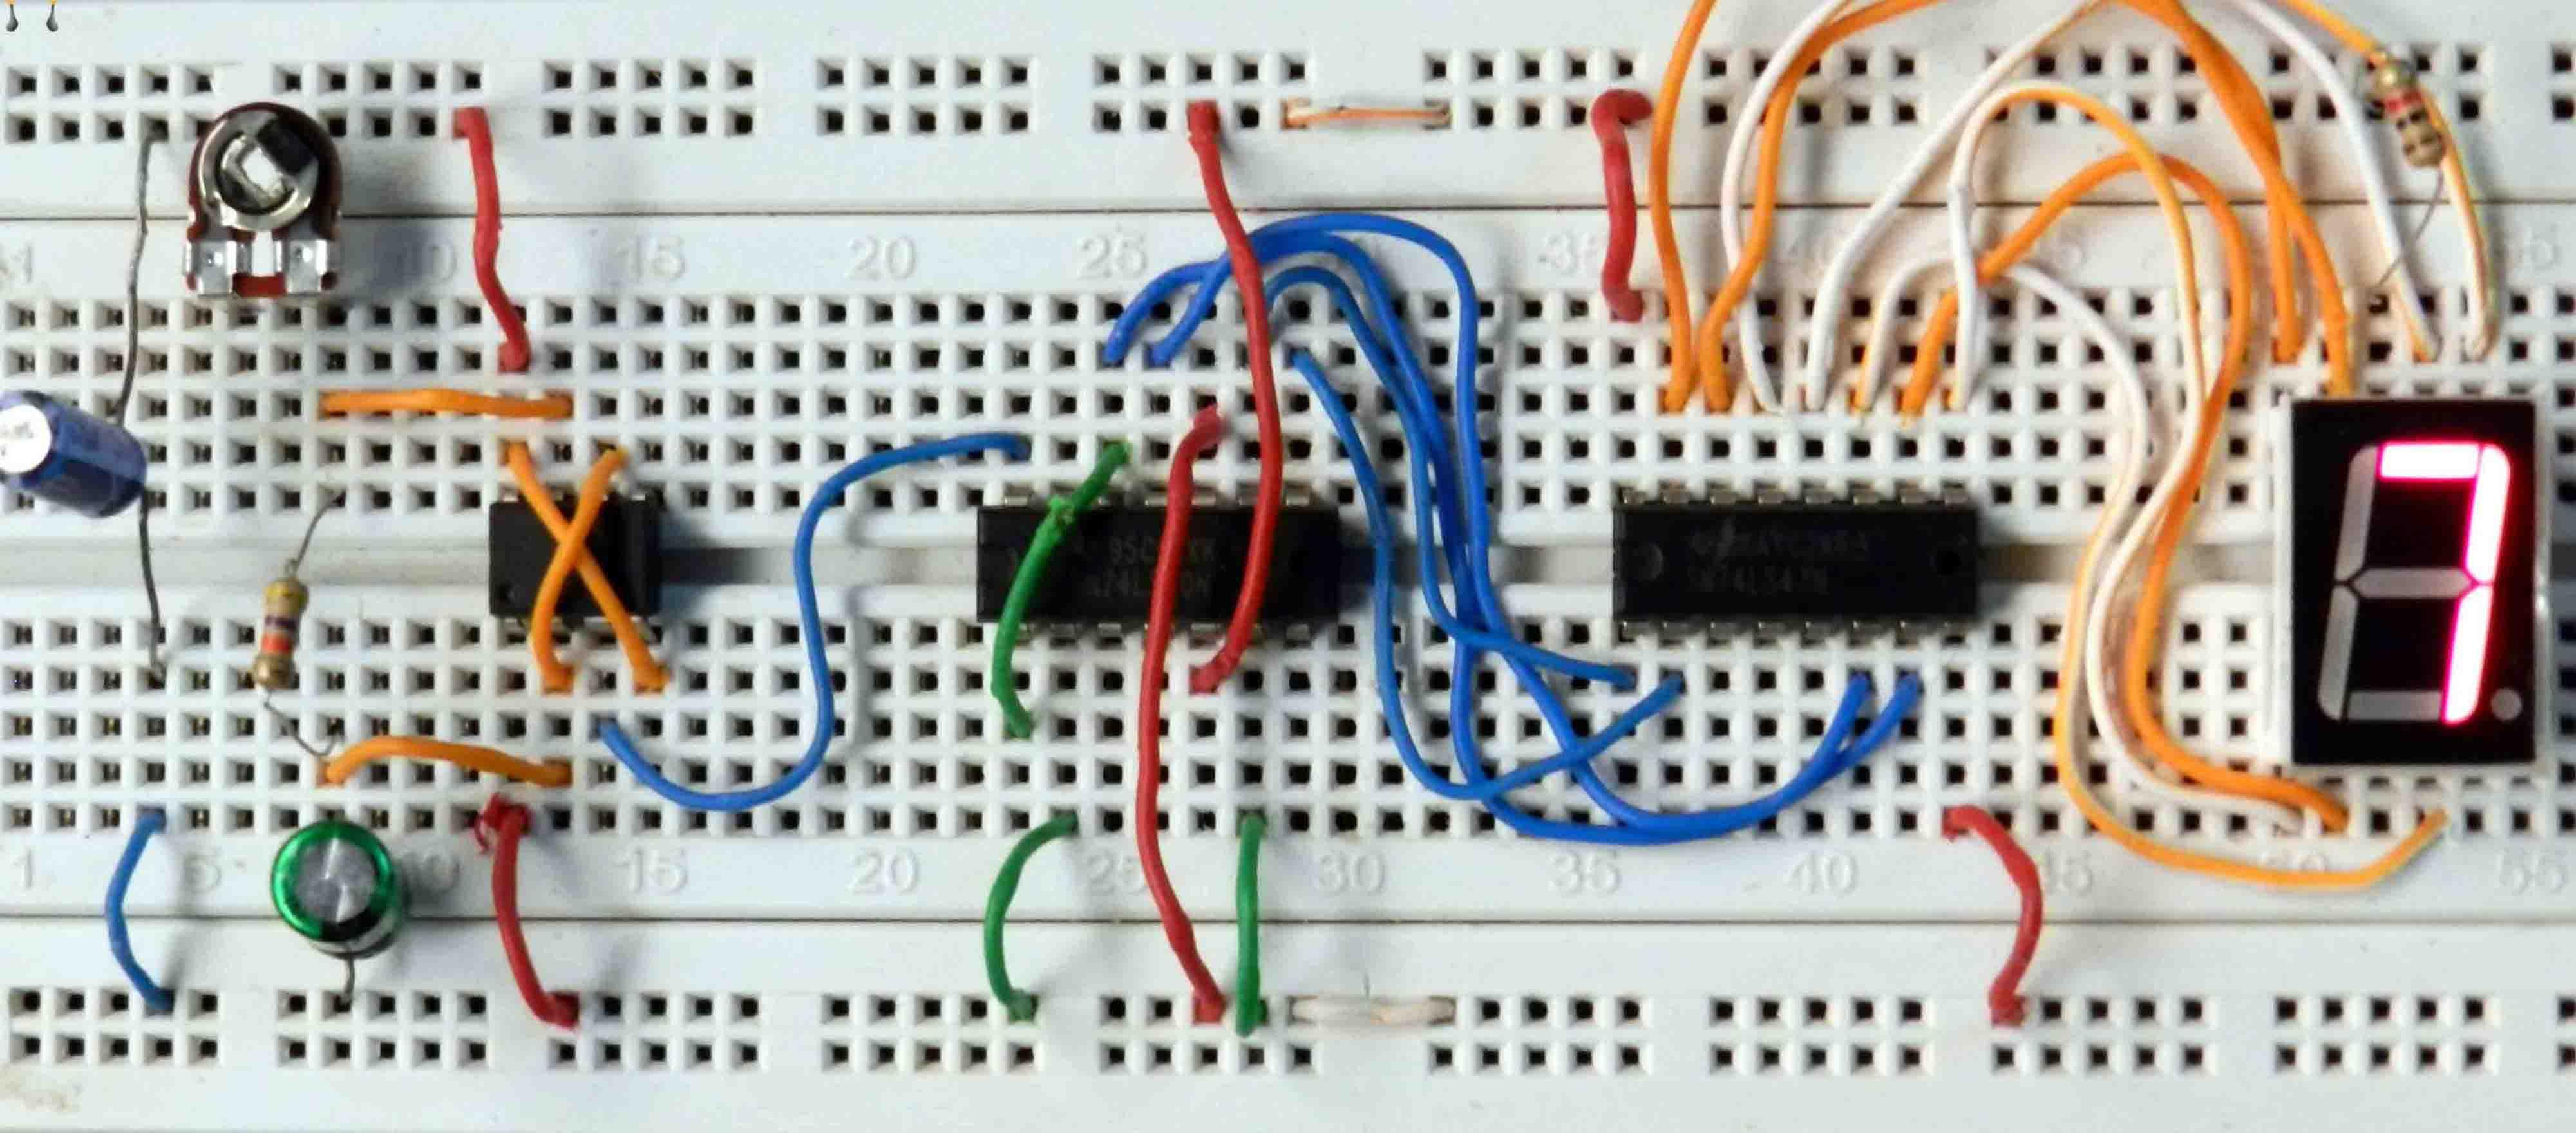 light sensor switch circuit diagram 3 phase autotransformer wiring mod-10 7 segment display | rookie electronics & robotics projects